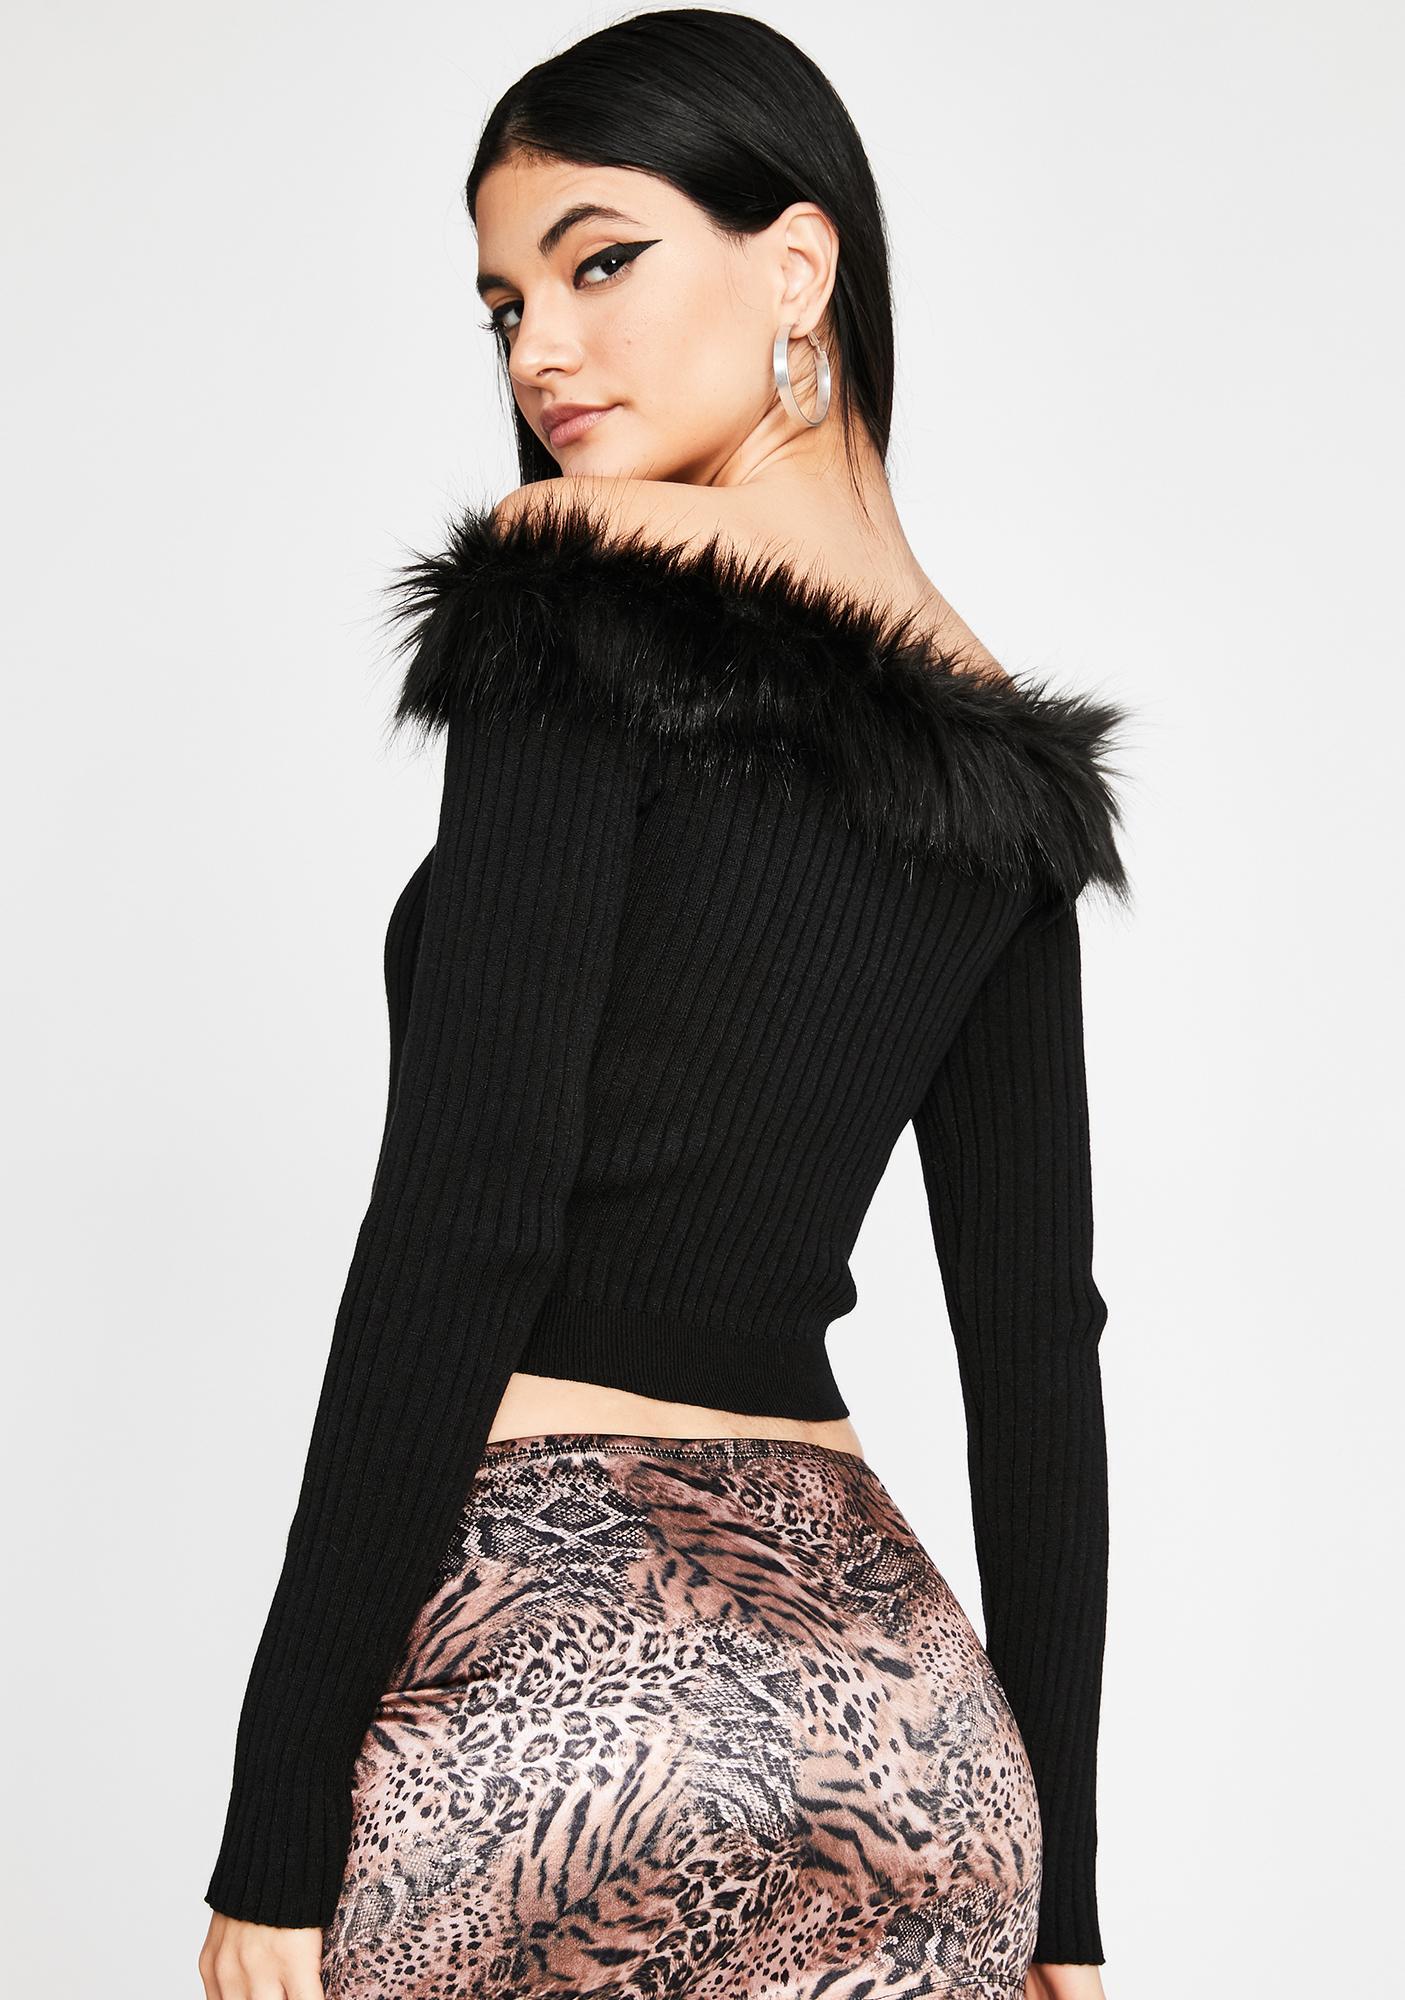 Designer Taste Faux Fur Sweater